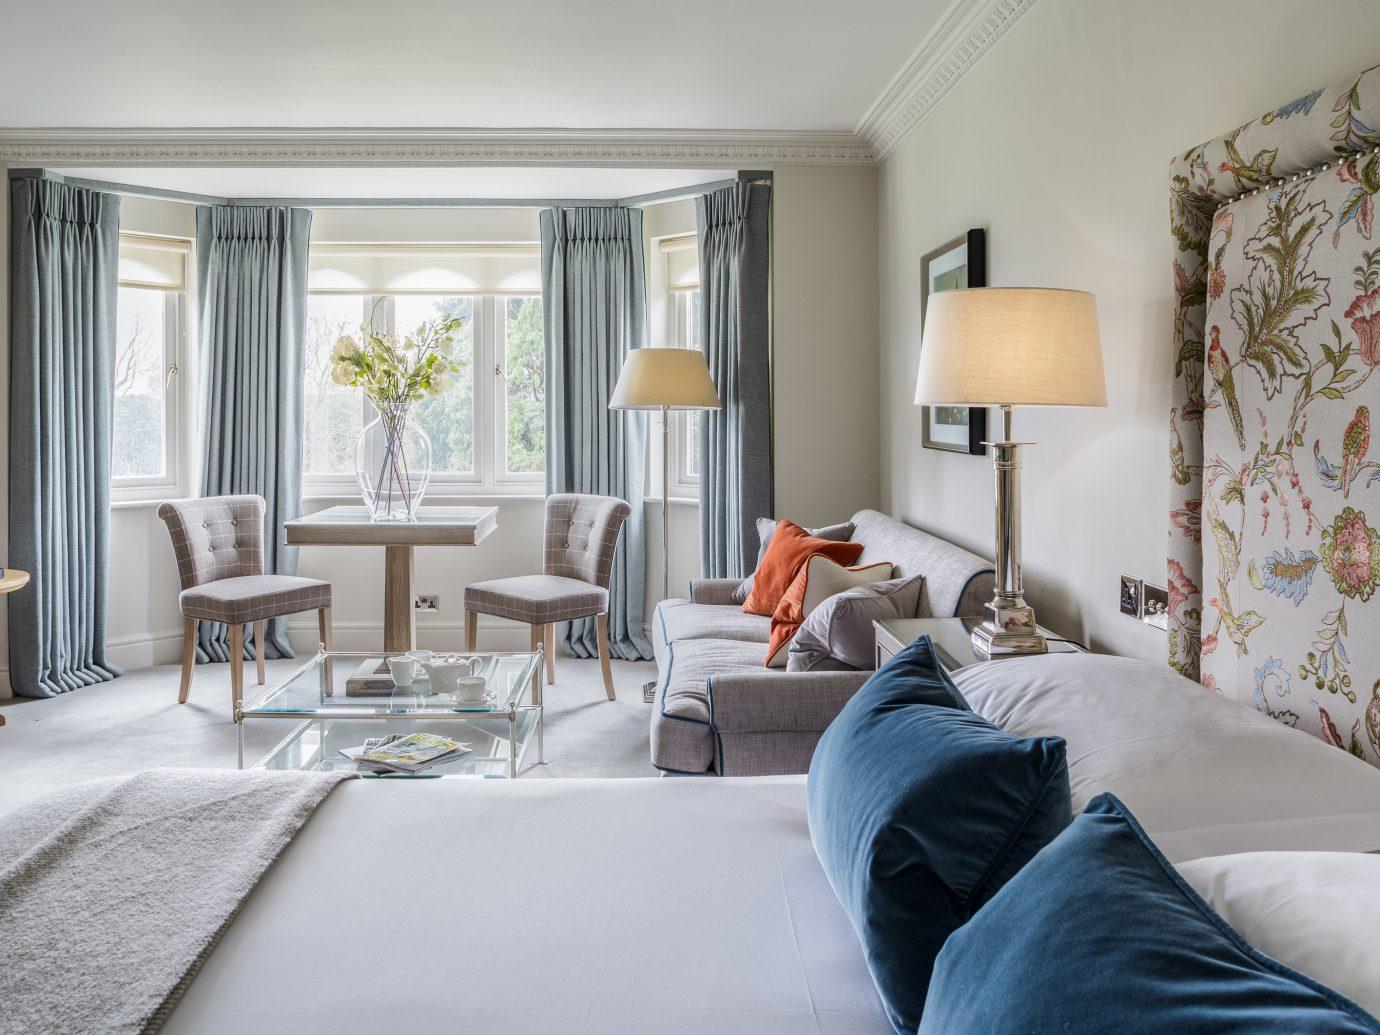 Trip Ideas indoor wall sofa bed room property living room hotel home interior design estate floor Suite cottage real estate Bedroom Design pillow apartment furniture